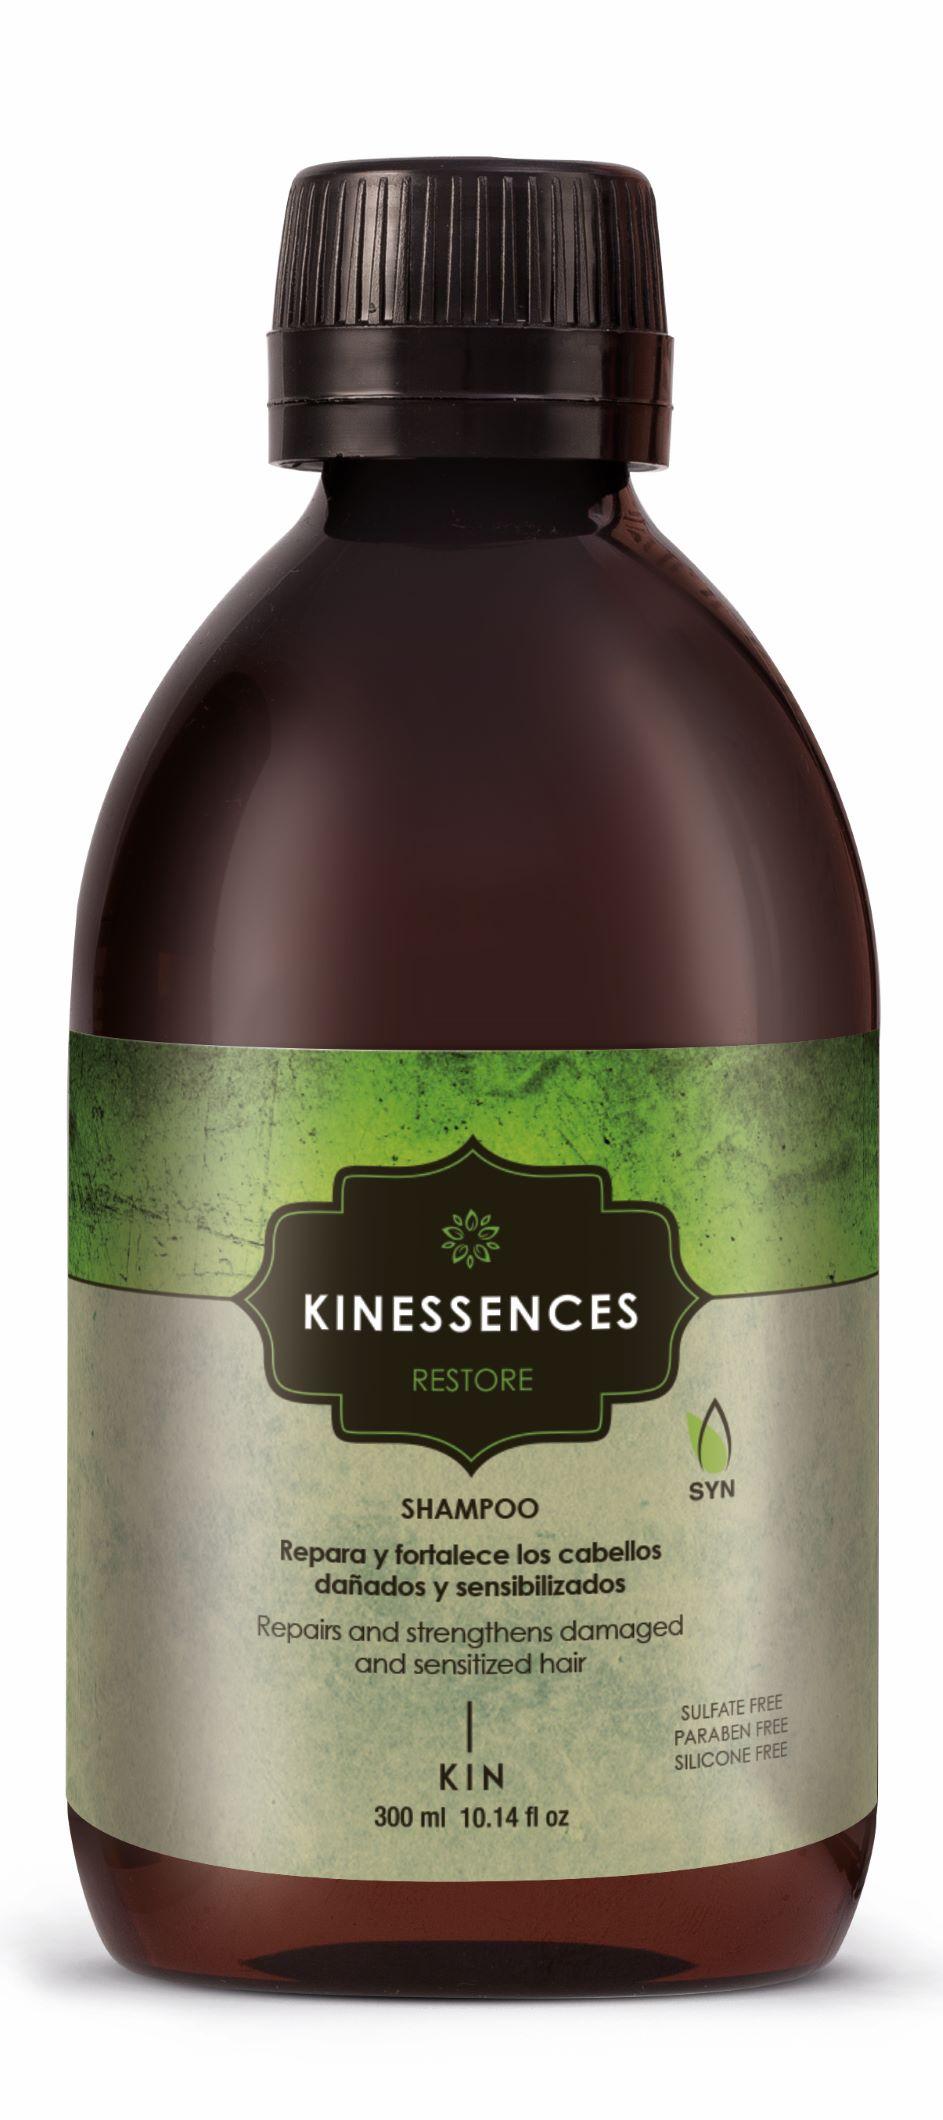 Shampoo Kinessences Restore Overnight 300 ml